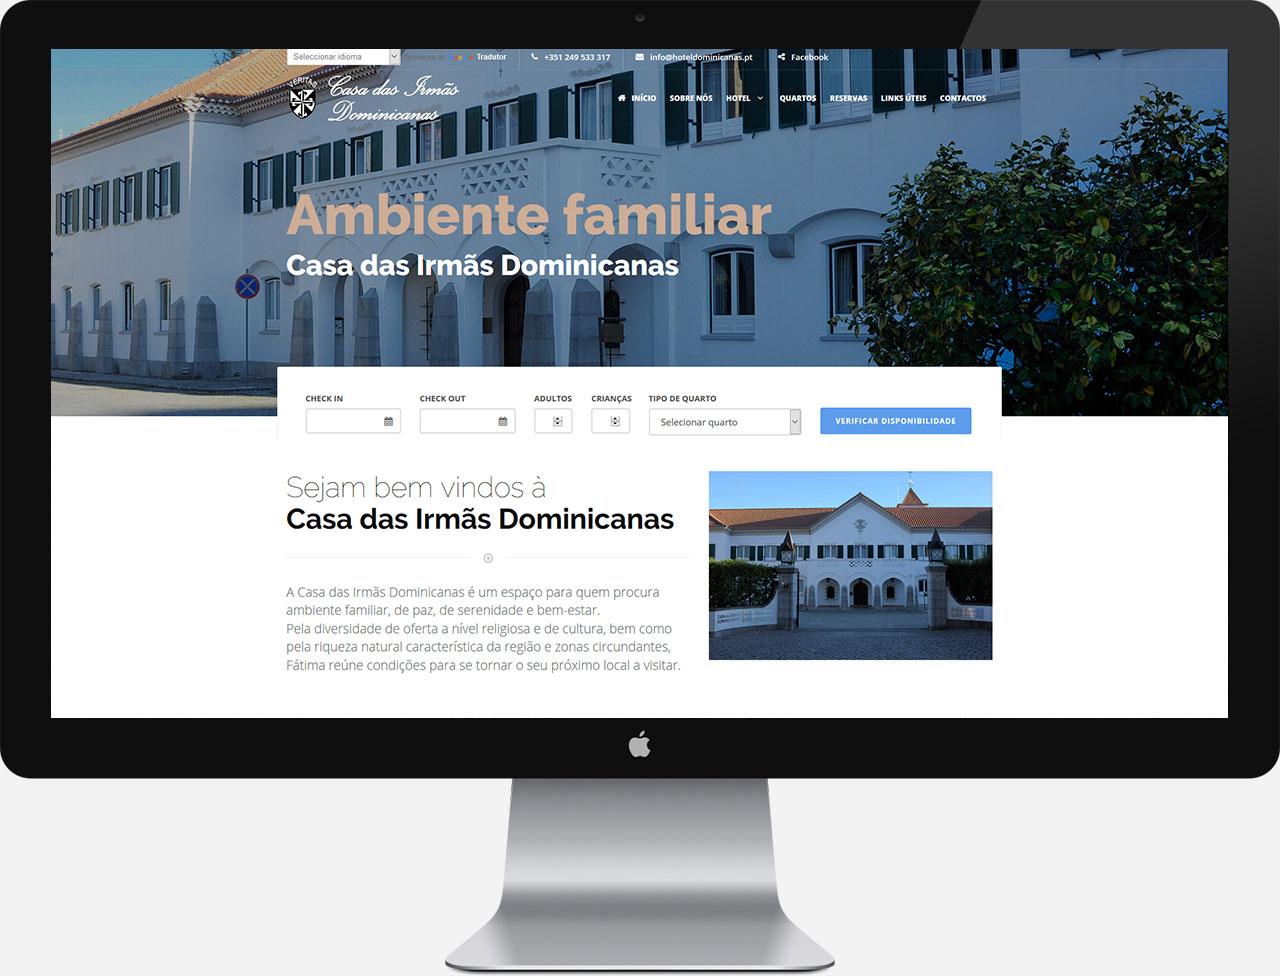 Hotel Irmãs Dominicanas